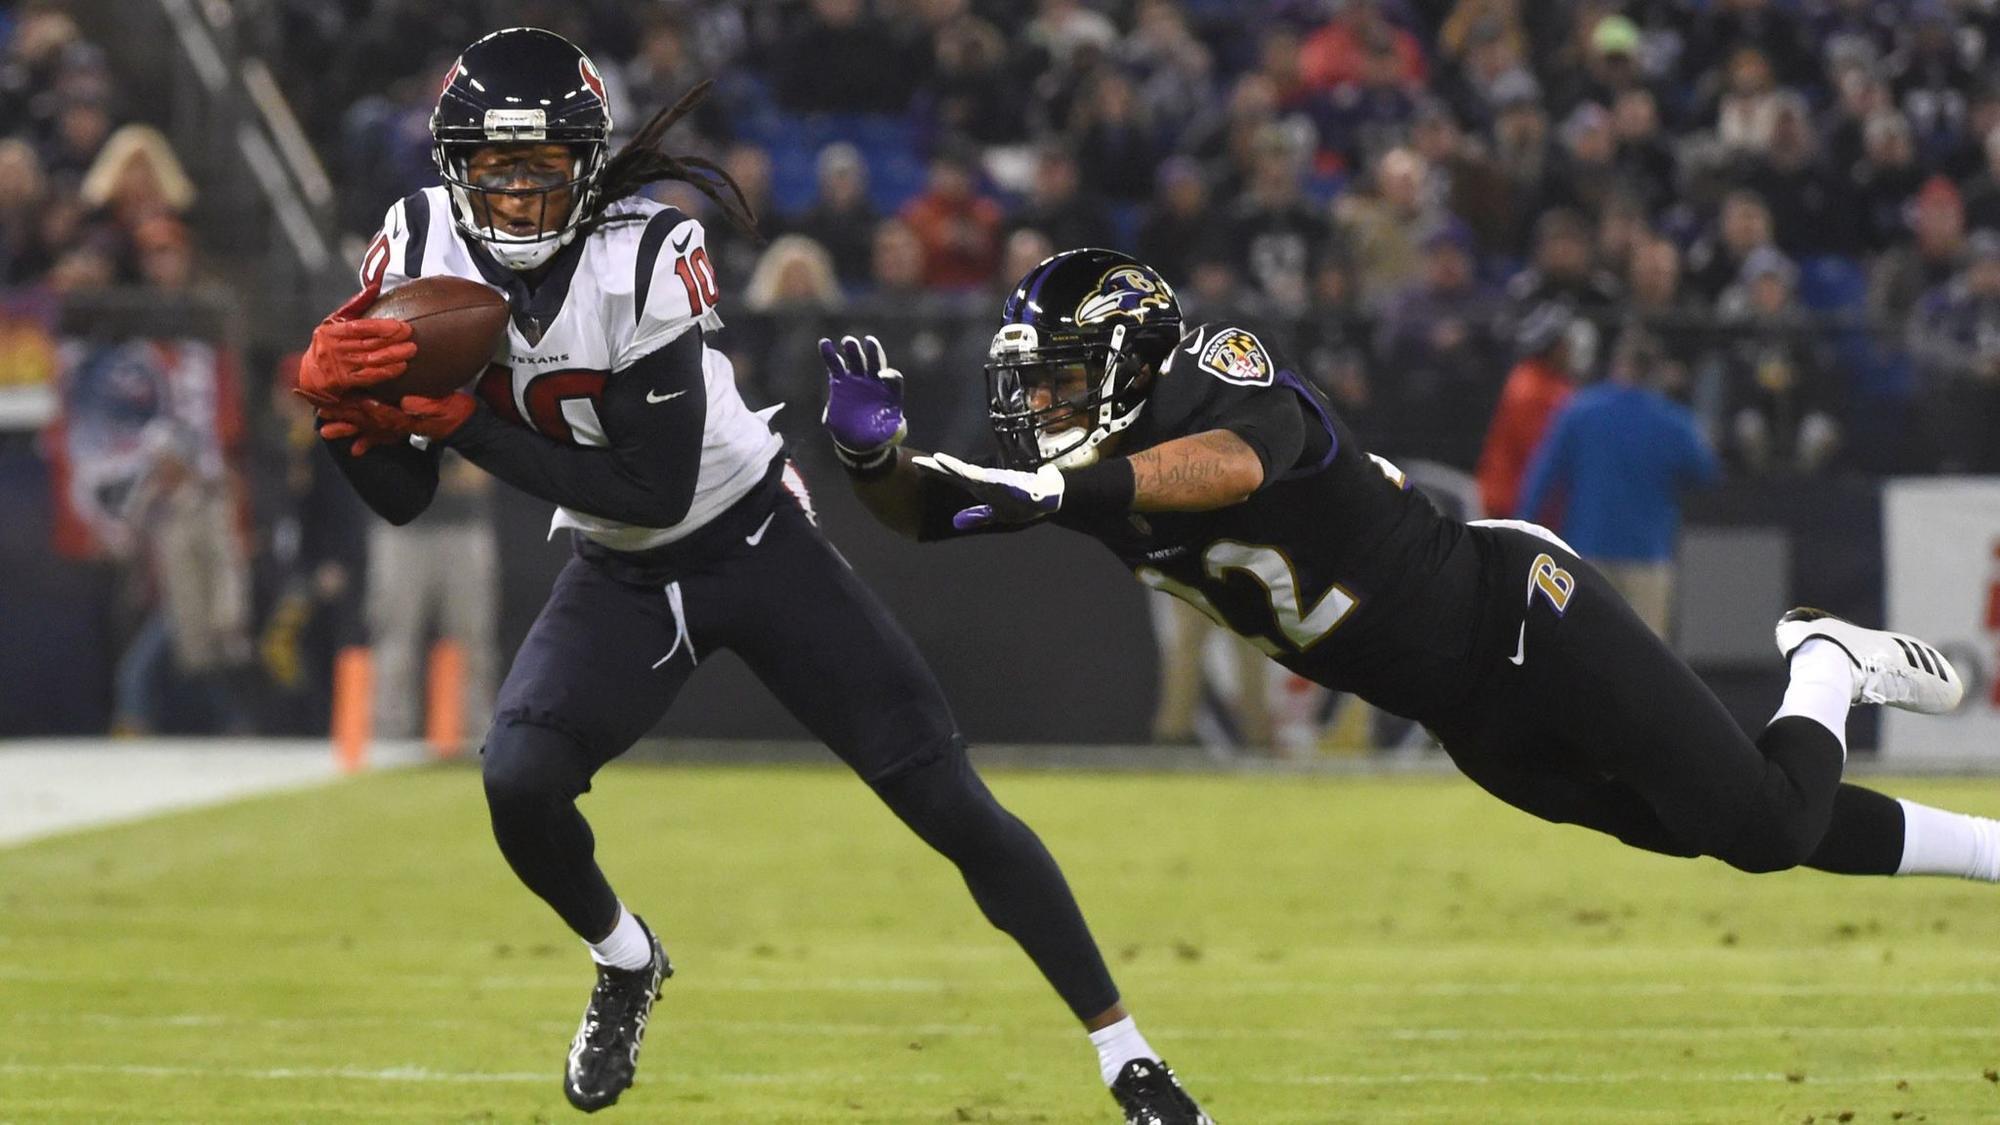 Ravens defense impressed by Texans wide receiver DeAndre Hopkins